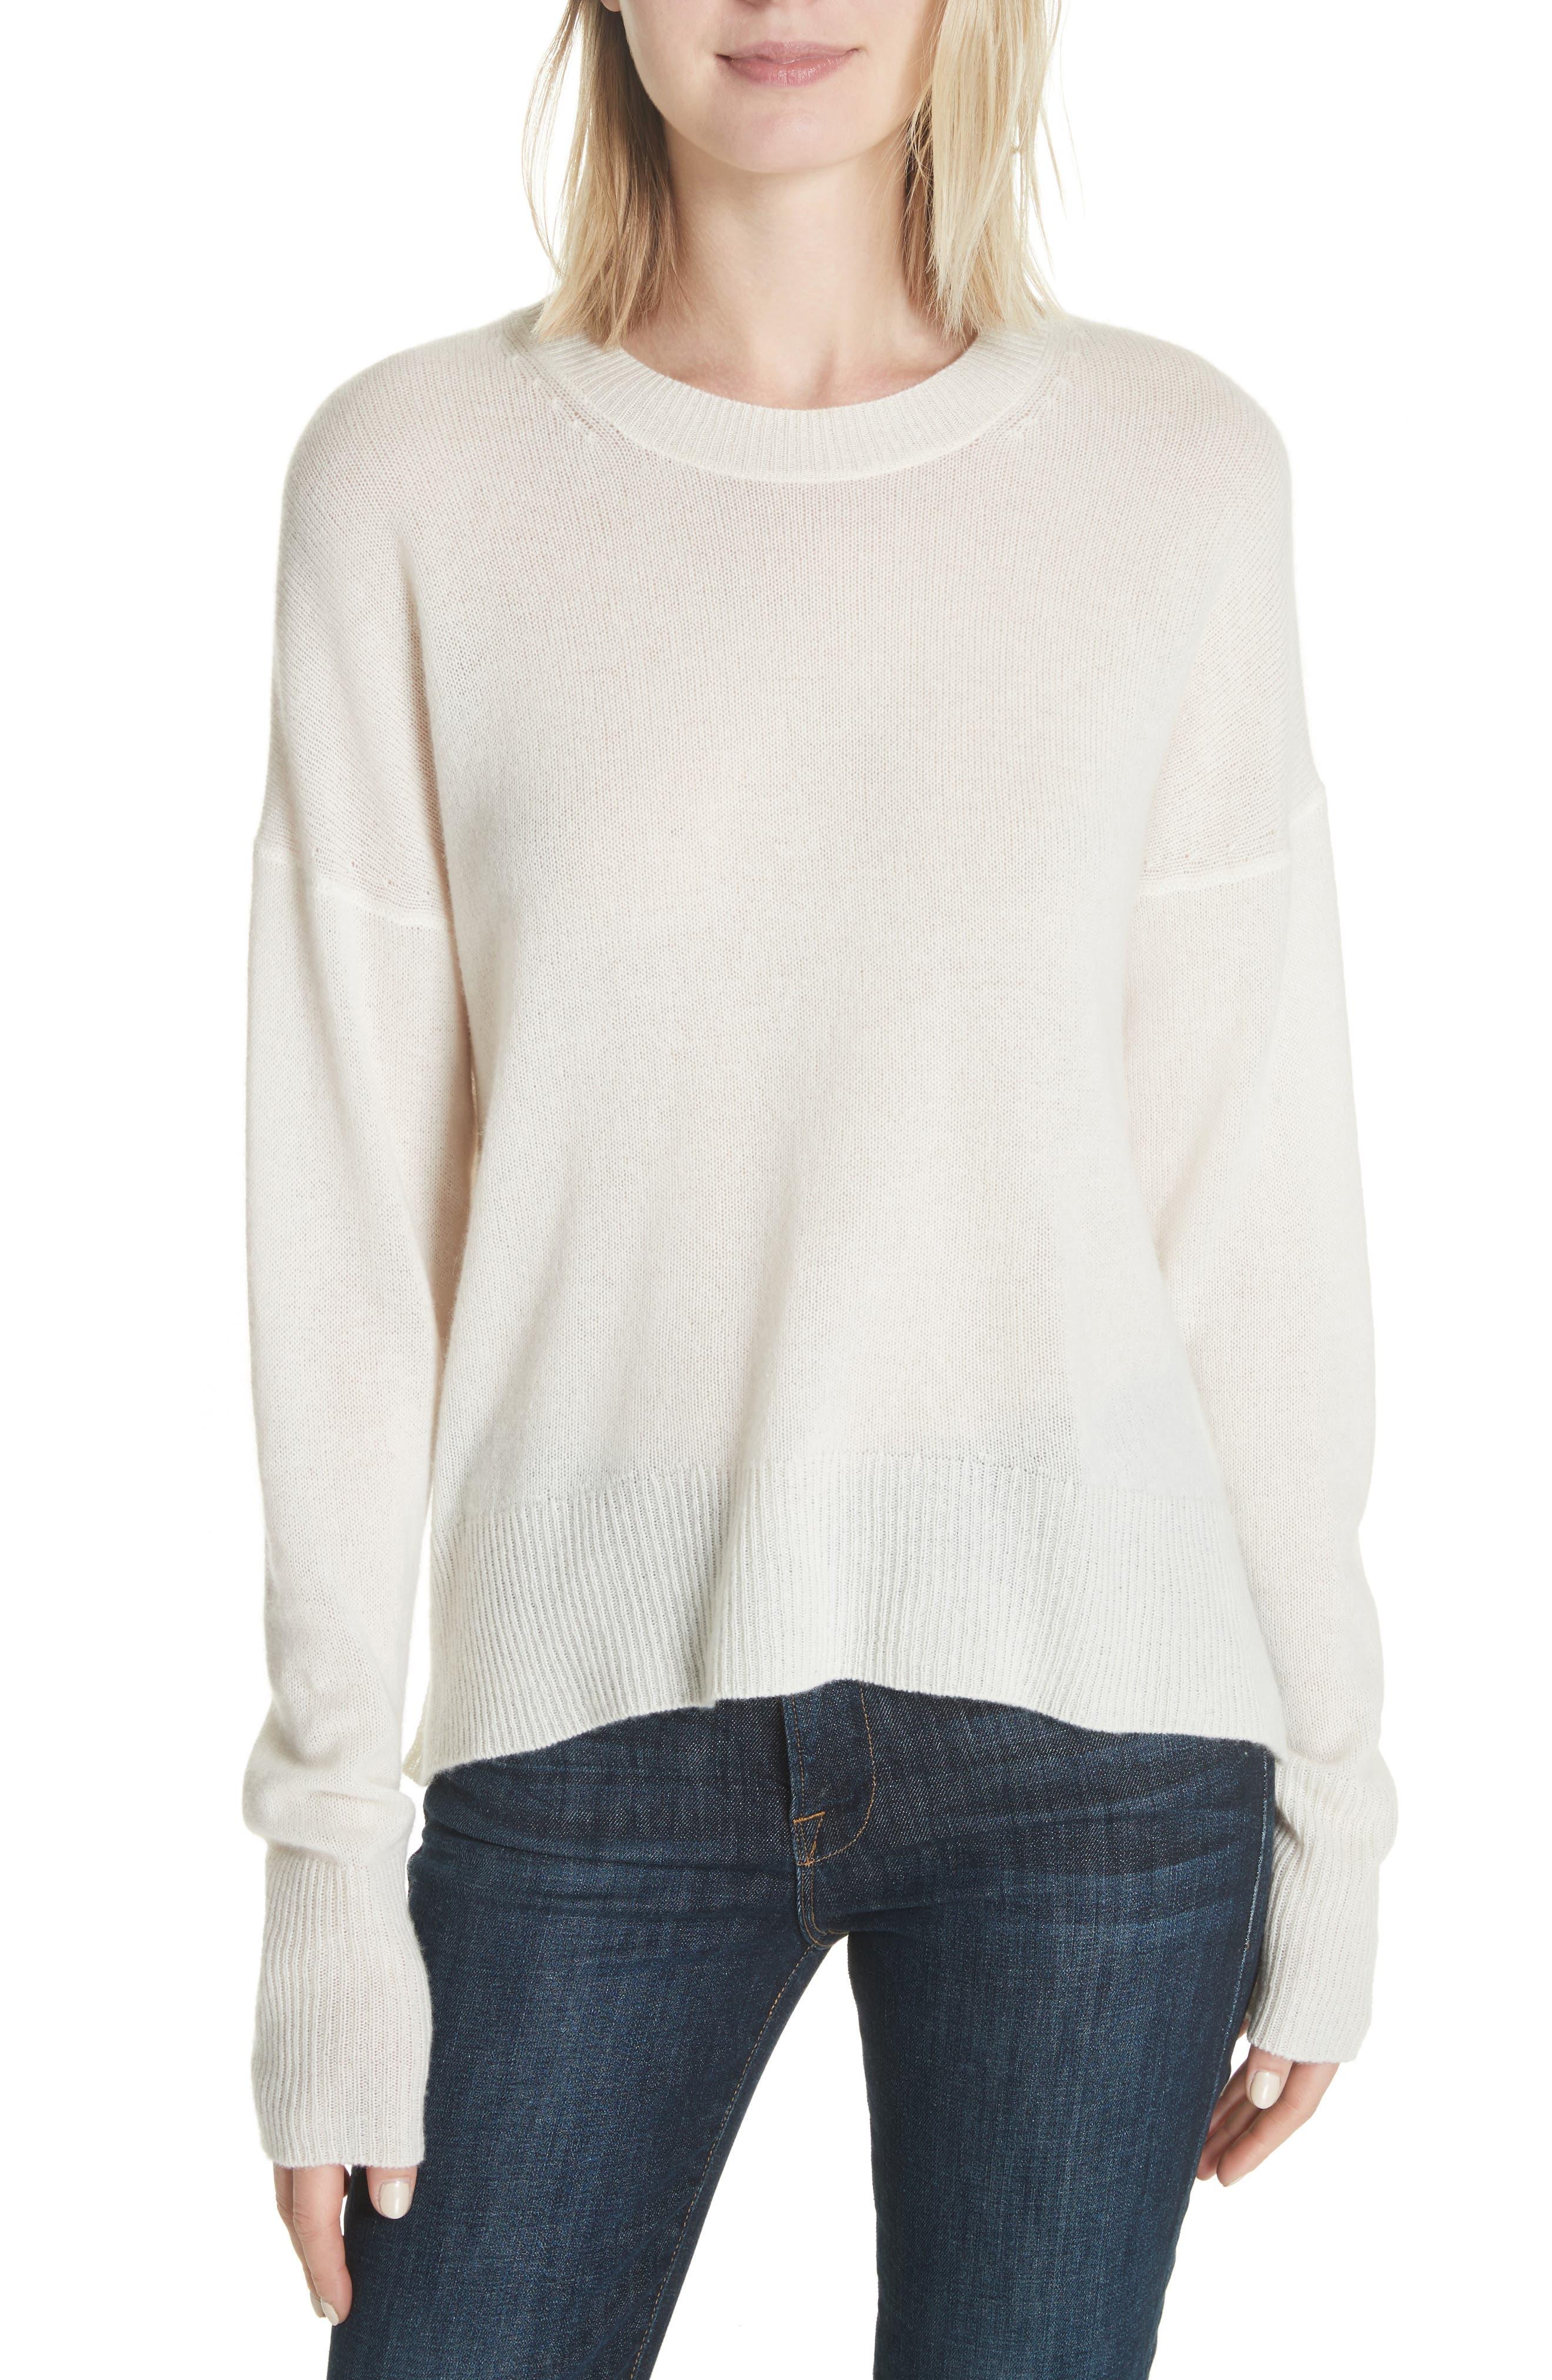 Karenia L Cashmere Sweater,                             Main thumbnail 3, color,